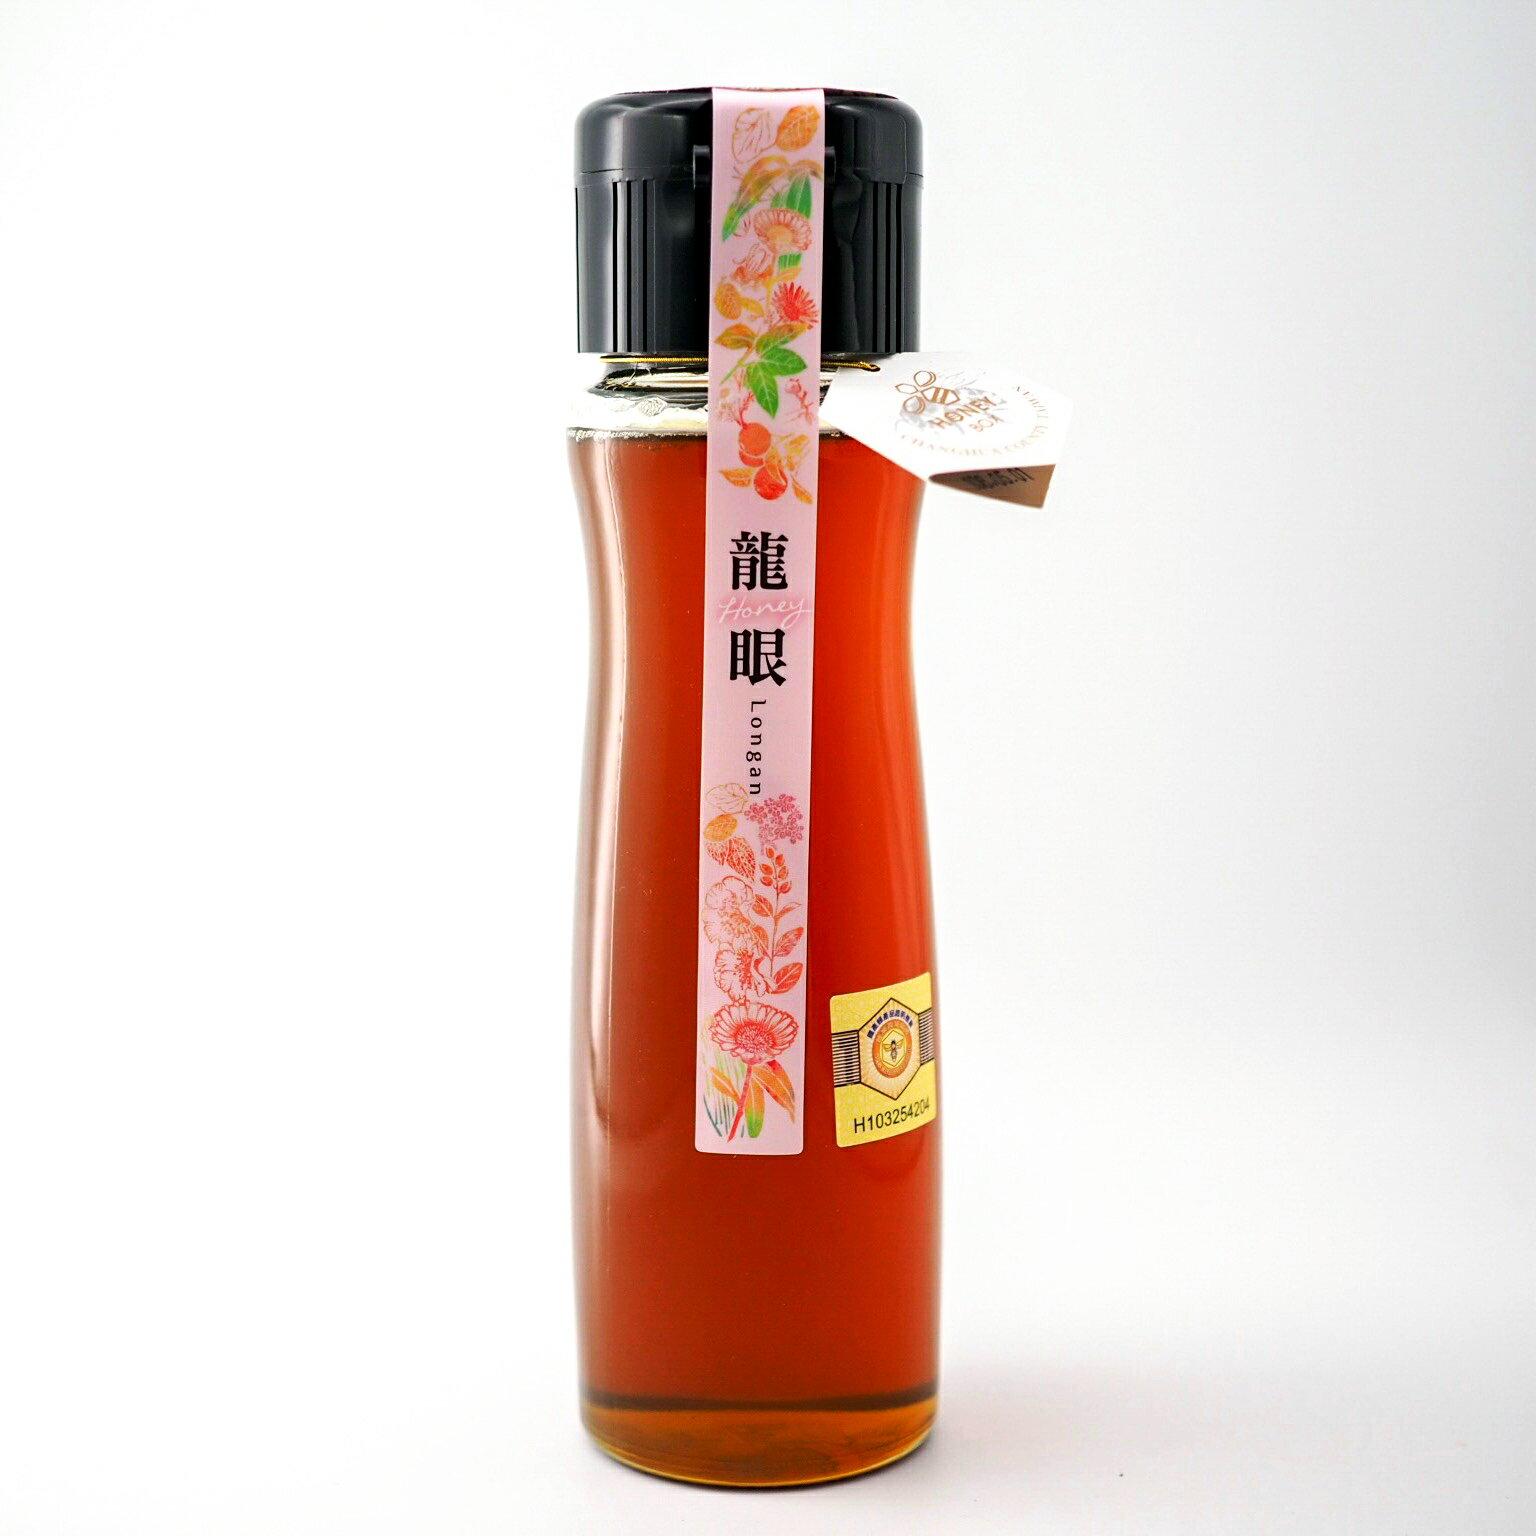 蜂盒子 認証龍眼蜂蜜Longan Honey-Certified domestic 620g